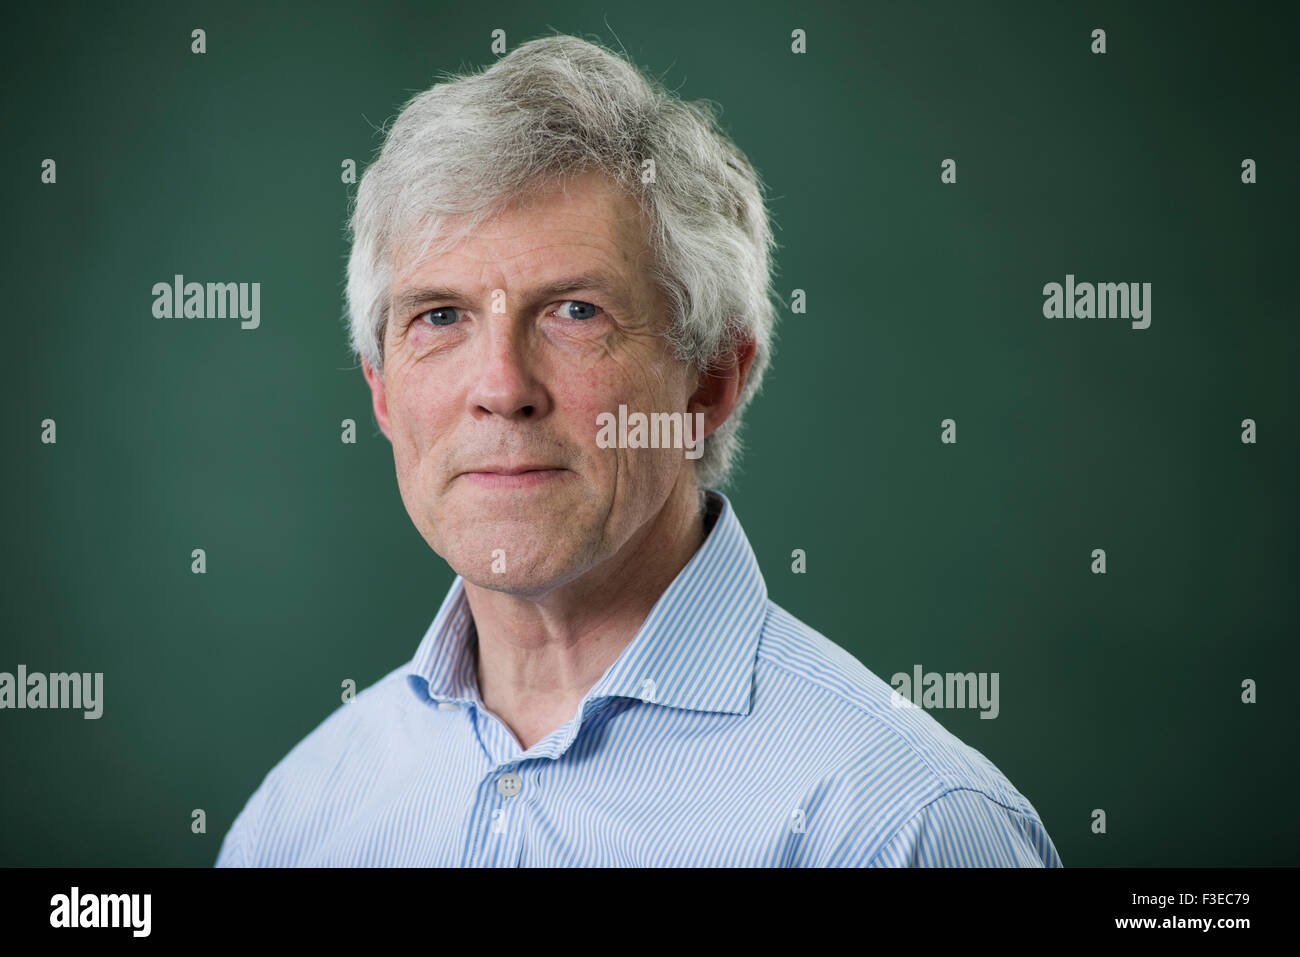 Doctor Stephen Bird. - Stock Image